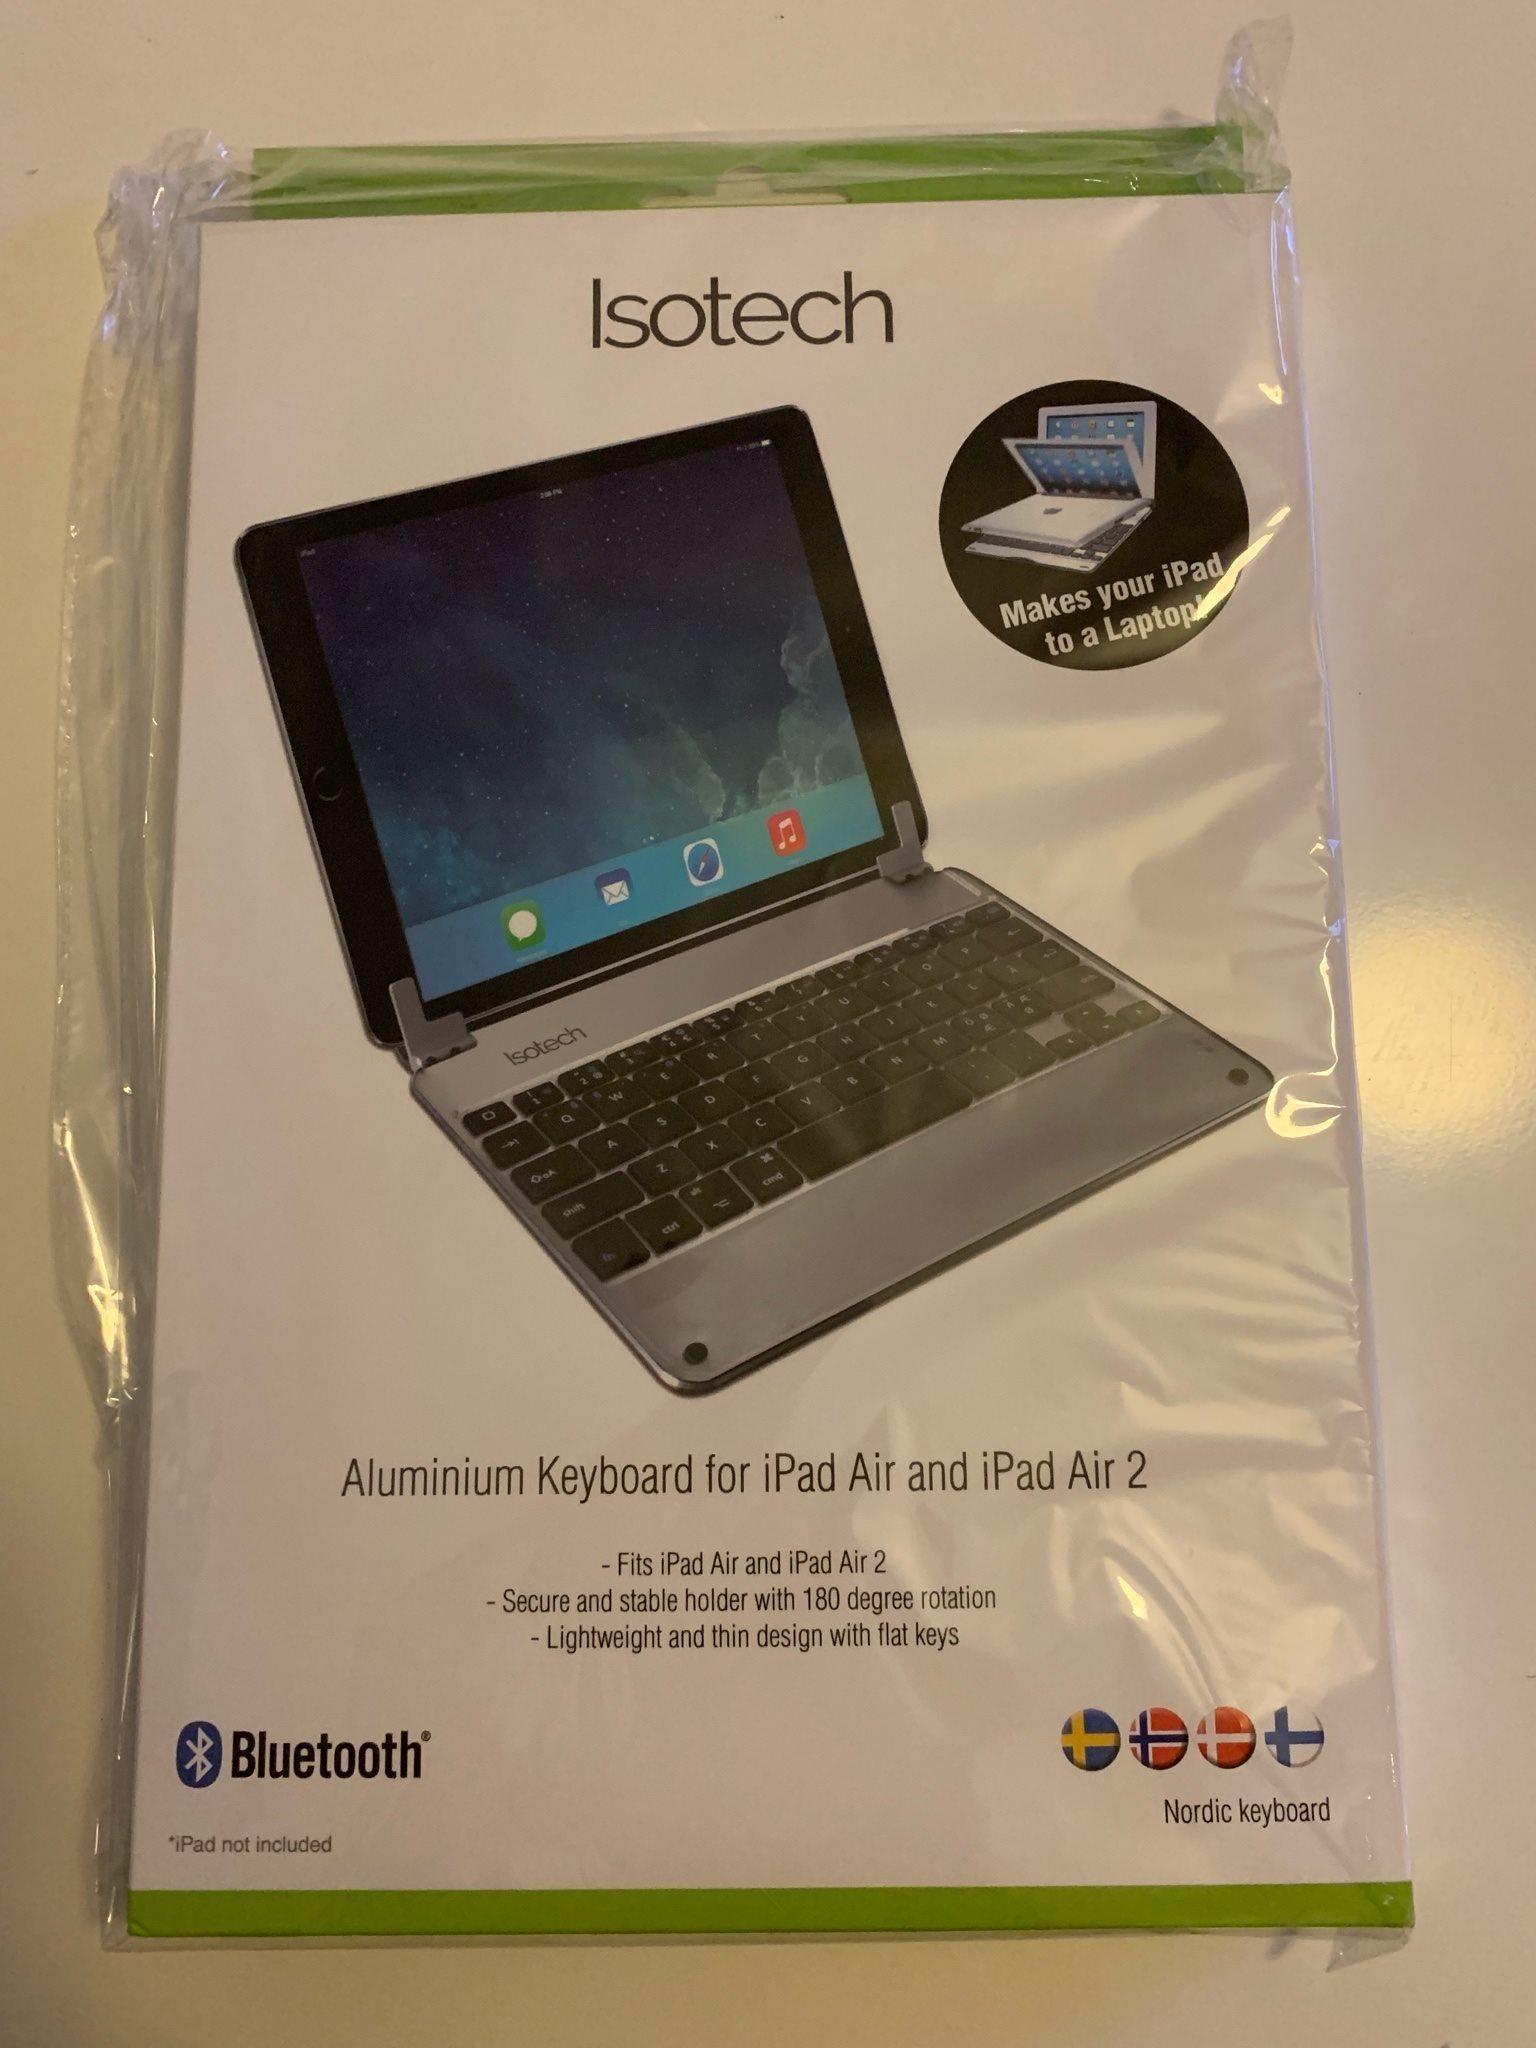 Isotech alu keyboard till IPad Air + Air 2 86b8879577285